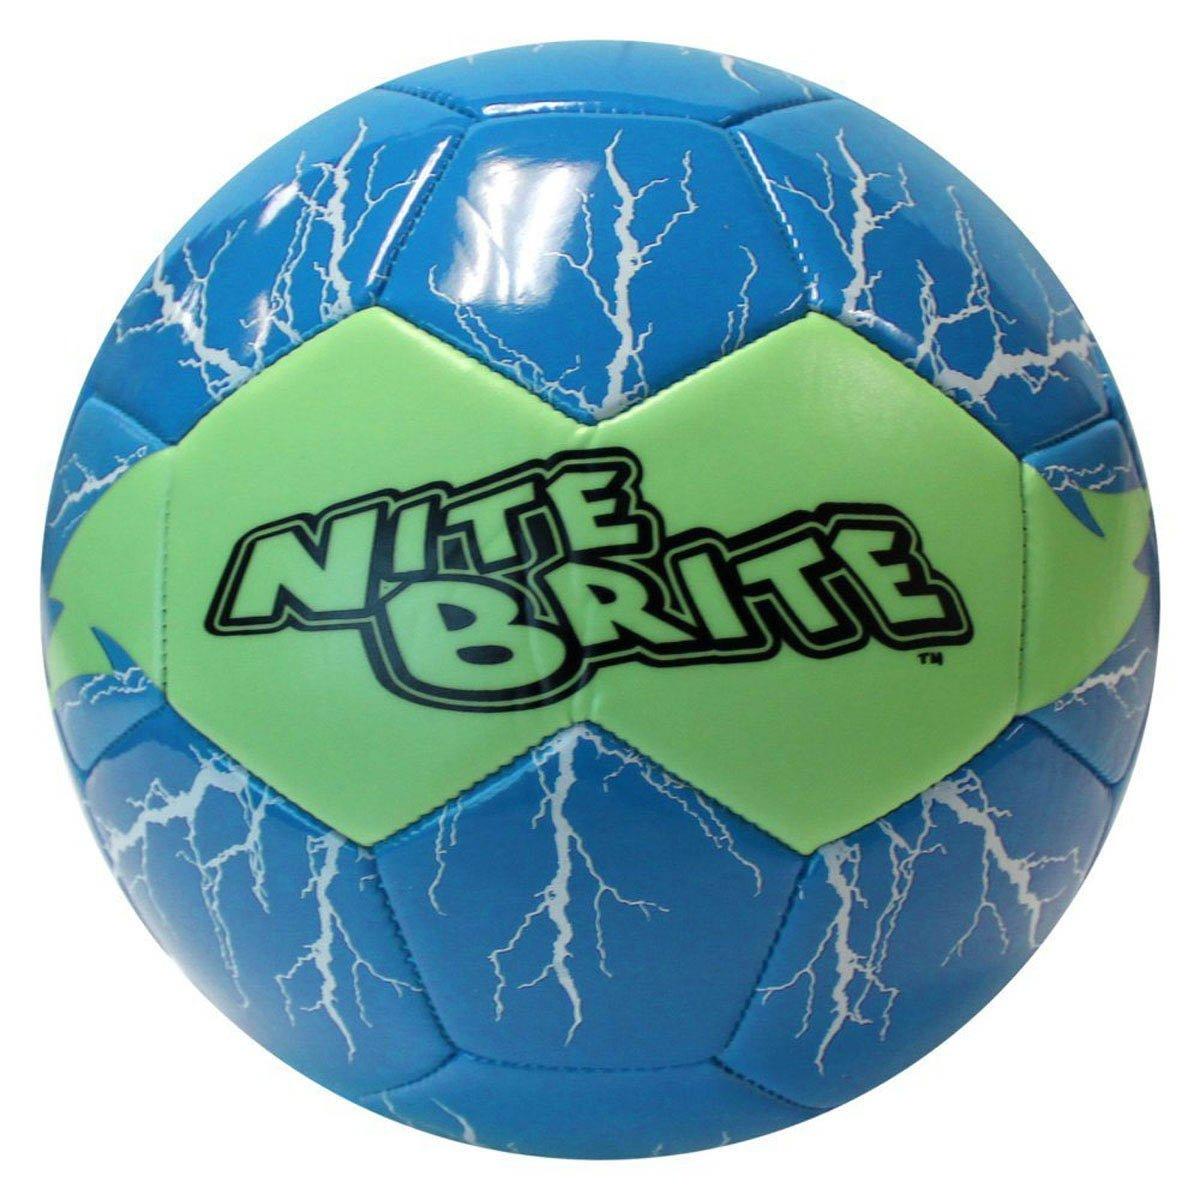 Baden Nite Brite deportes balón de fútbol - S140G-107-P8 ...